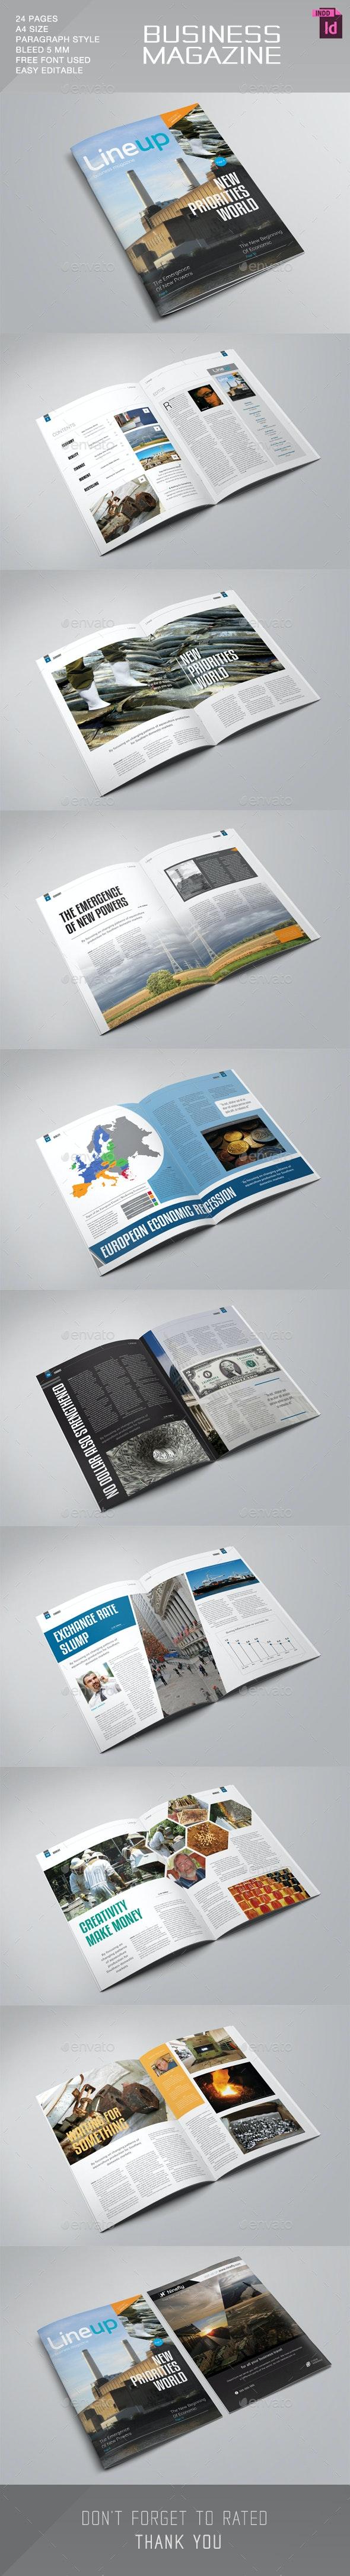 Lineup Magazine Template - Magazines Print Templates